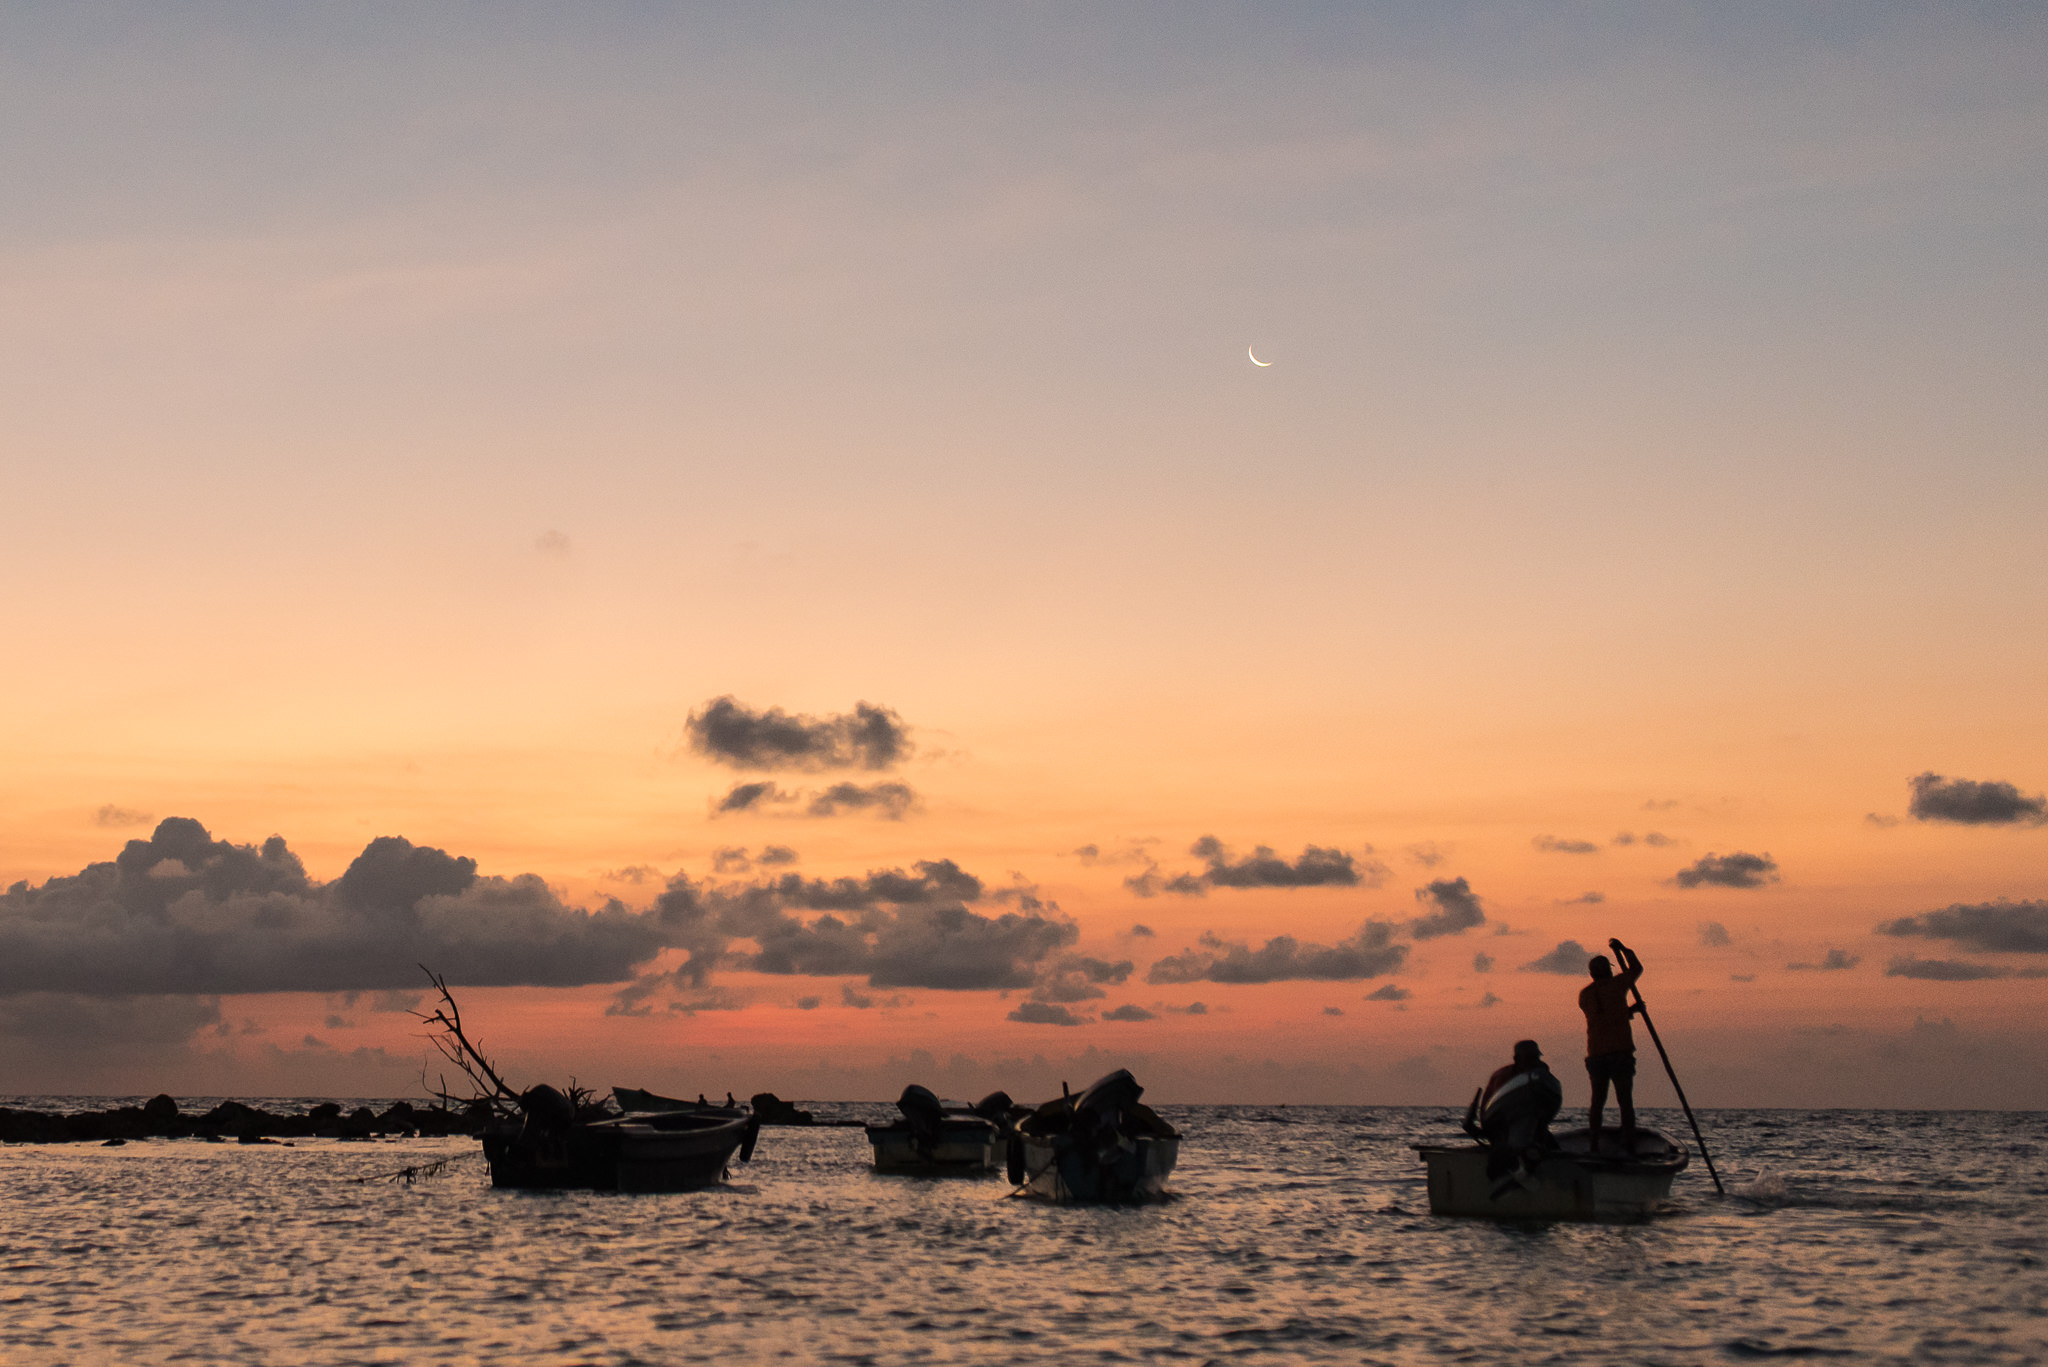 barco_sai_sanandres_colombia_caribe_fisherman_haya_sky_blue_isla_island_00016.jpg